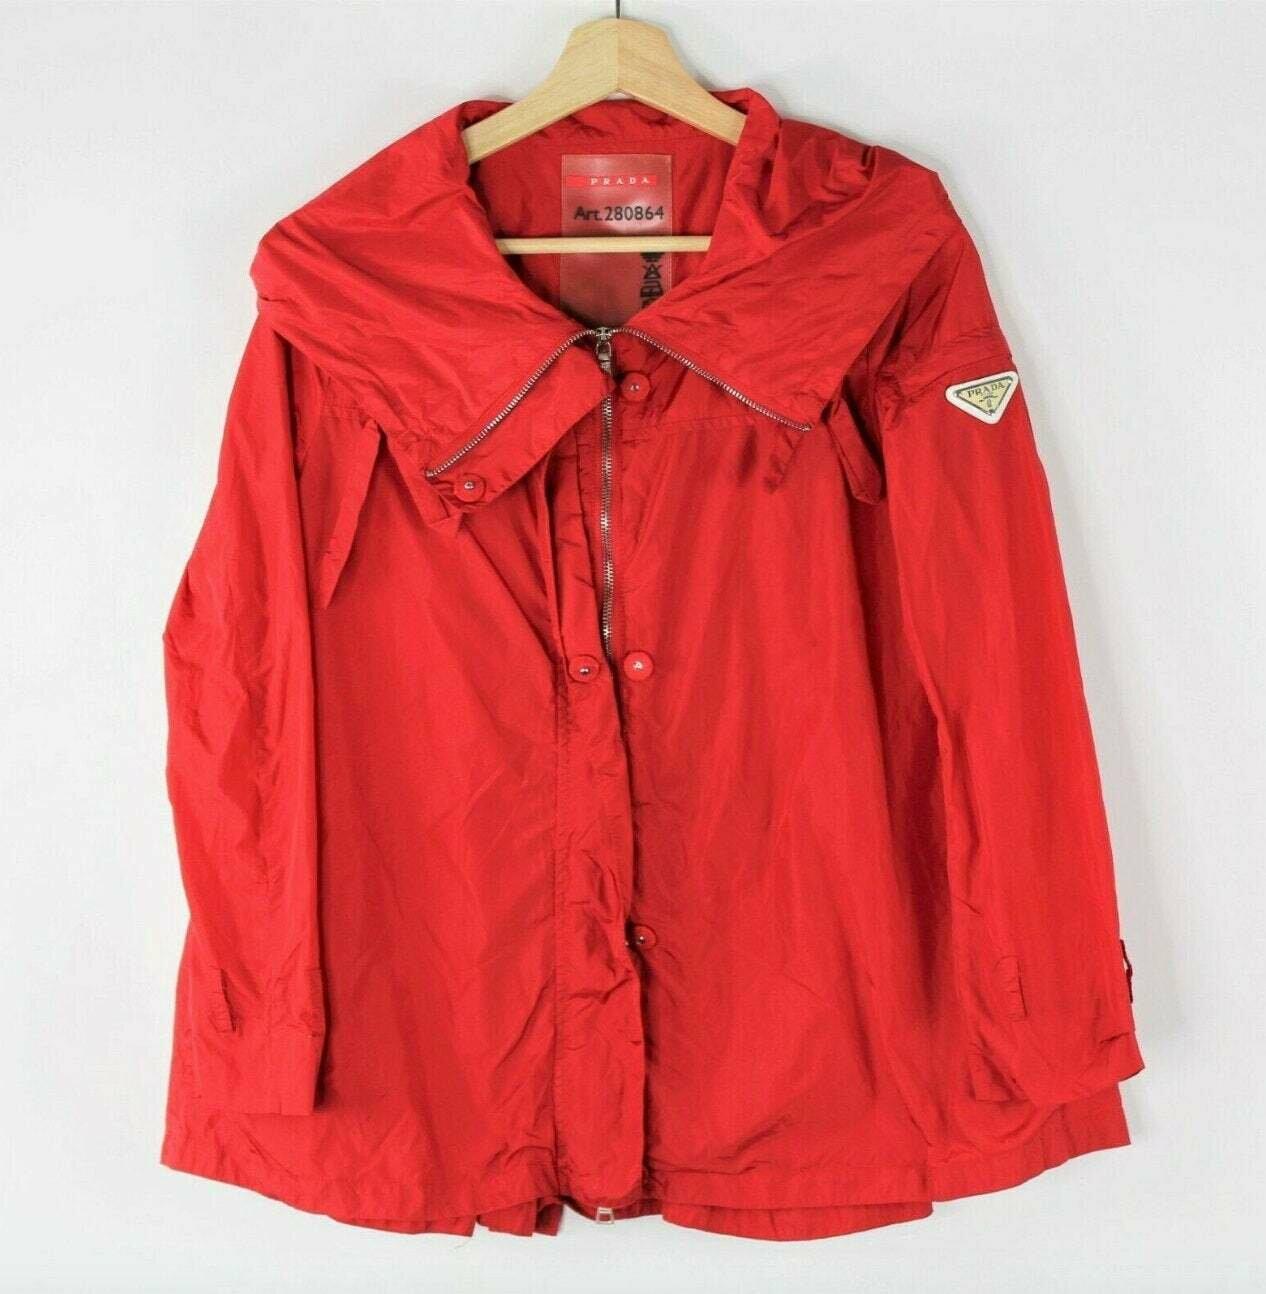 Vintage 90's PRADA MILANO Logo Plate Red Sport Windbreaker Athletic Jacket Coat S / M